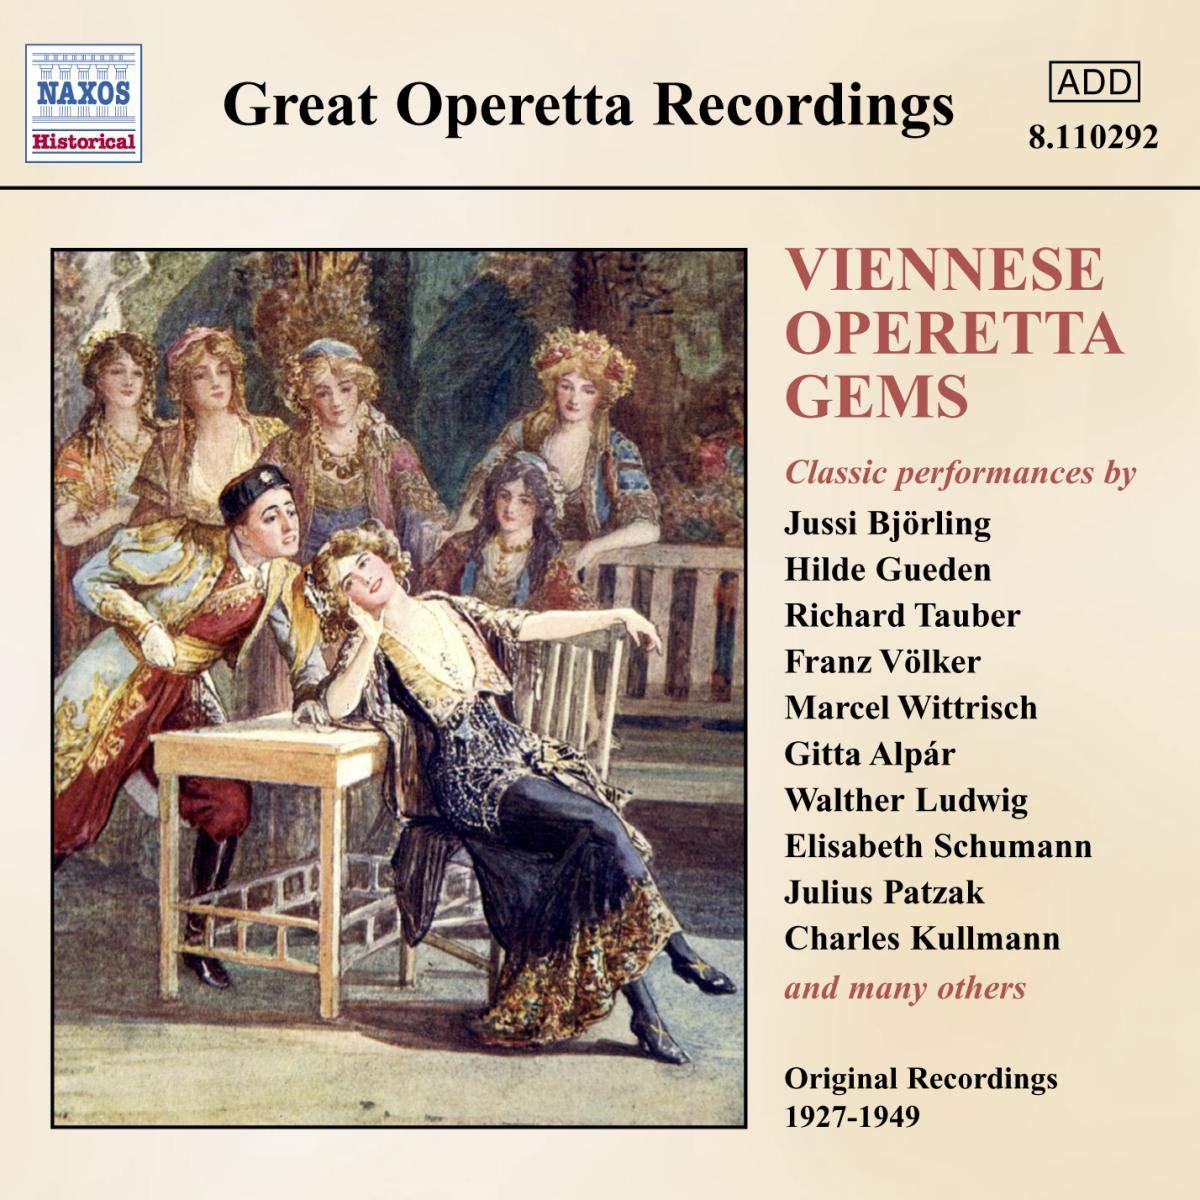 Viennese Operetta Gems Time sale gift